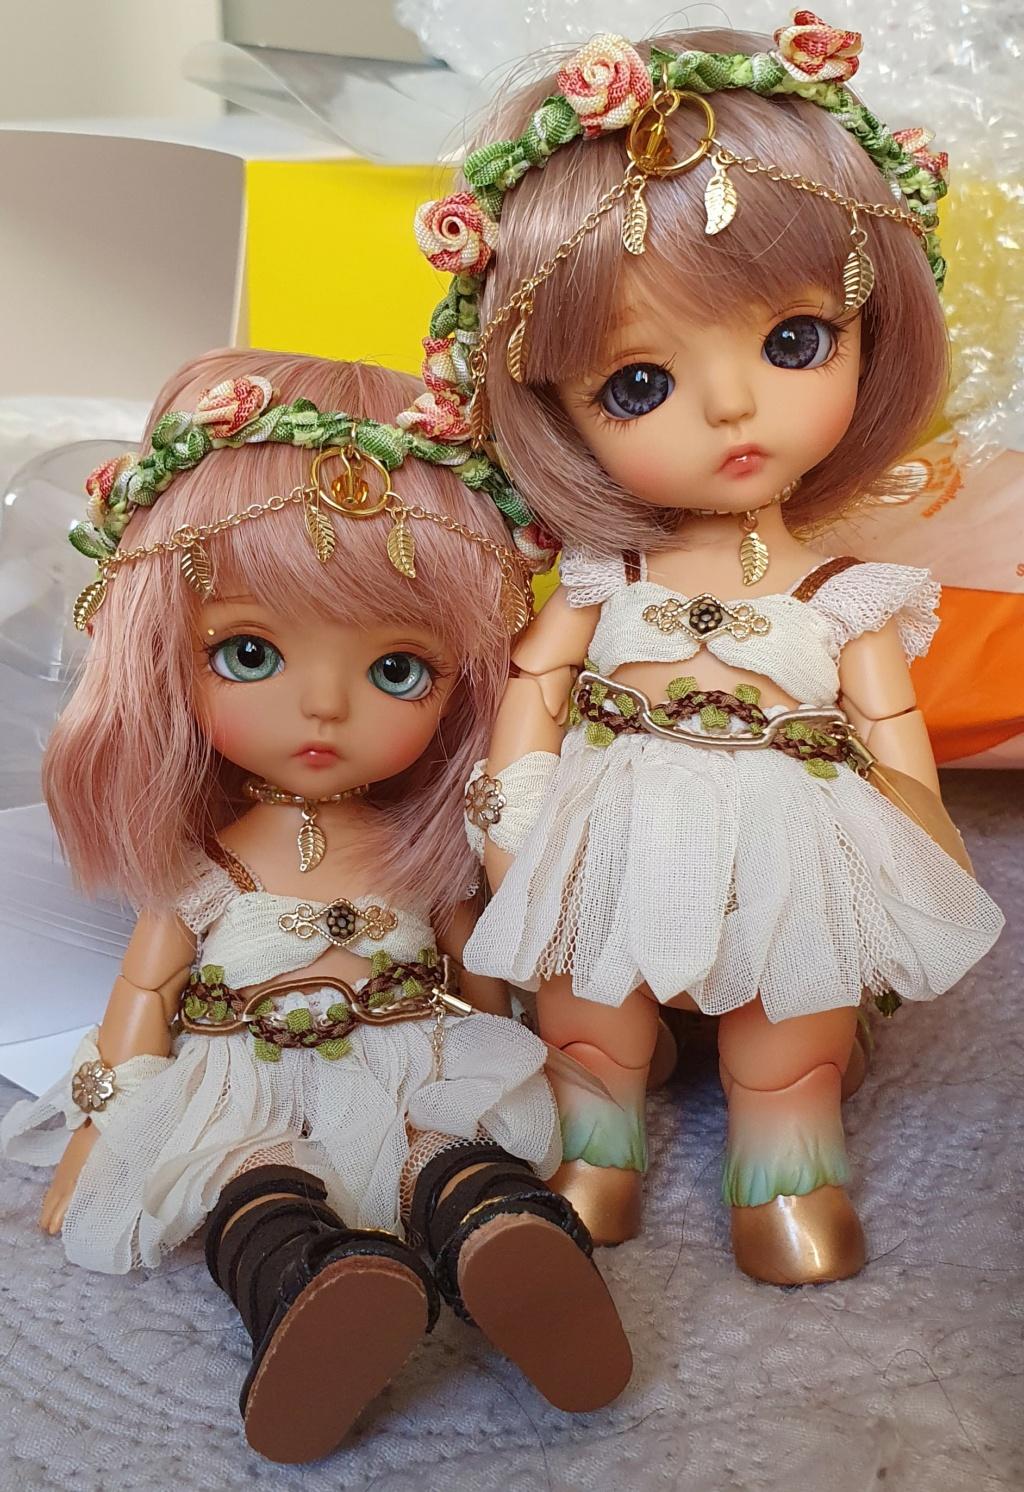 News doll Flower Garden kenta S.Belle tan 20200512